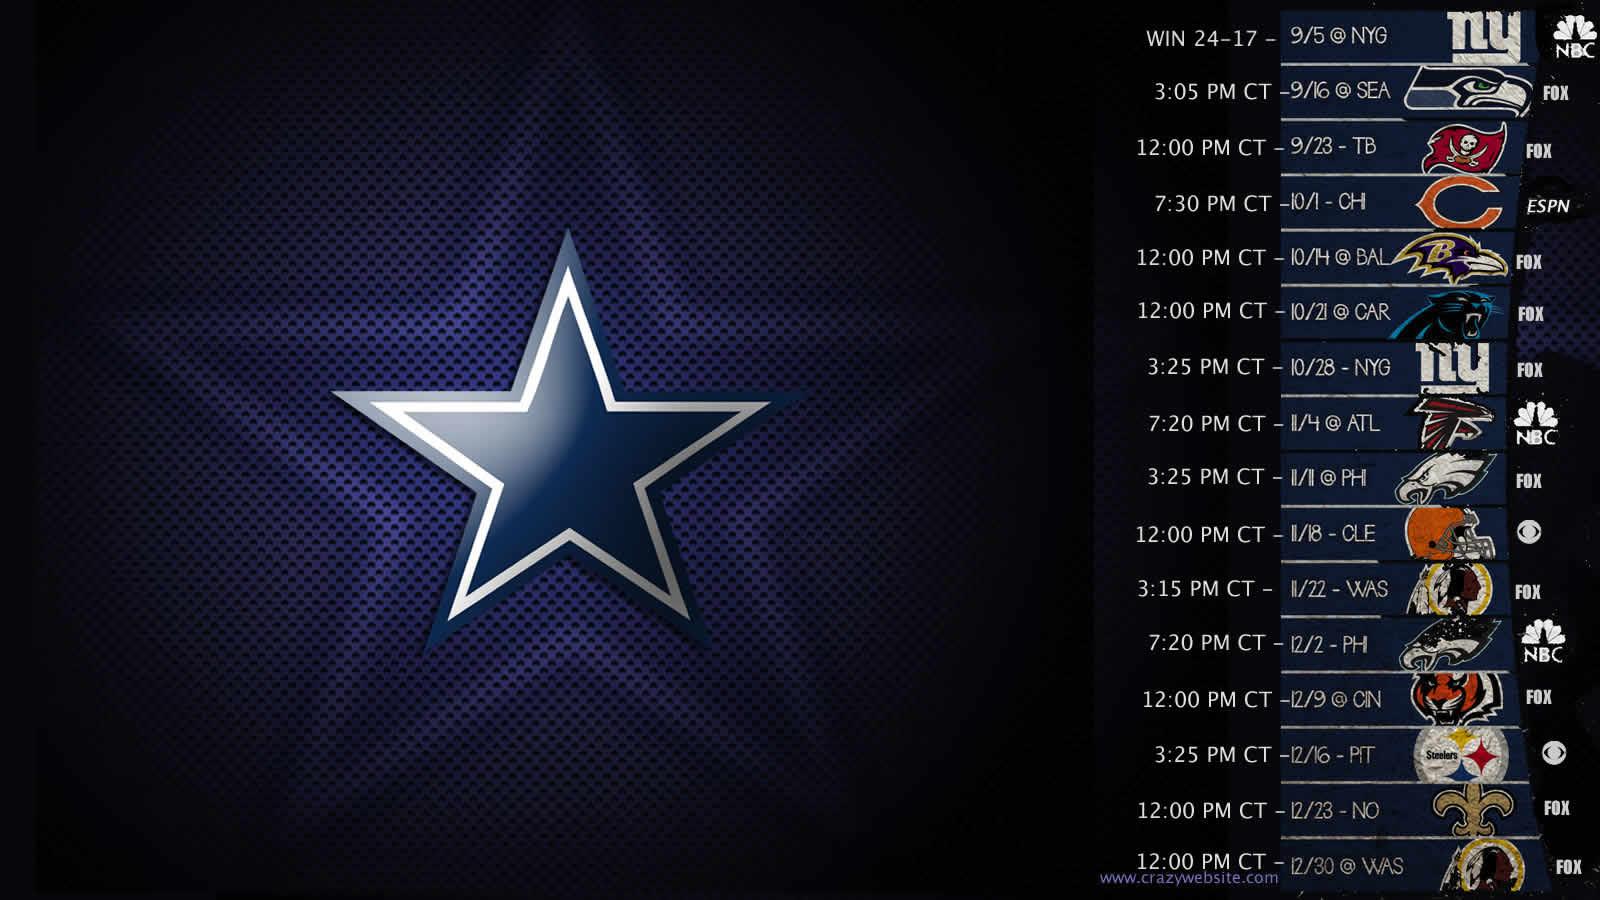 Awesome Dallas Cowboys wallpaper wallpaper Dallas Cowboys wallpapers 1600x900